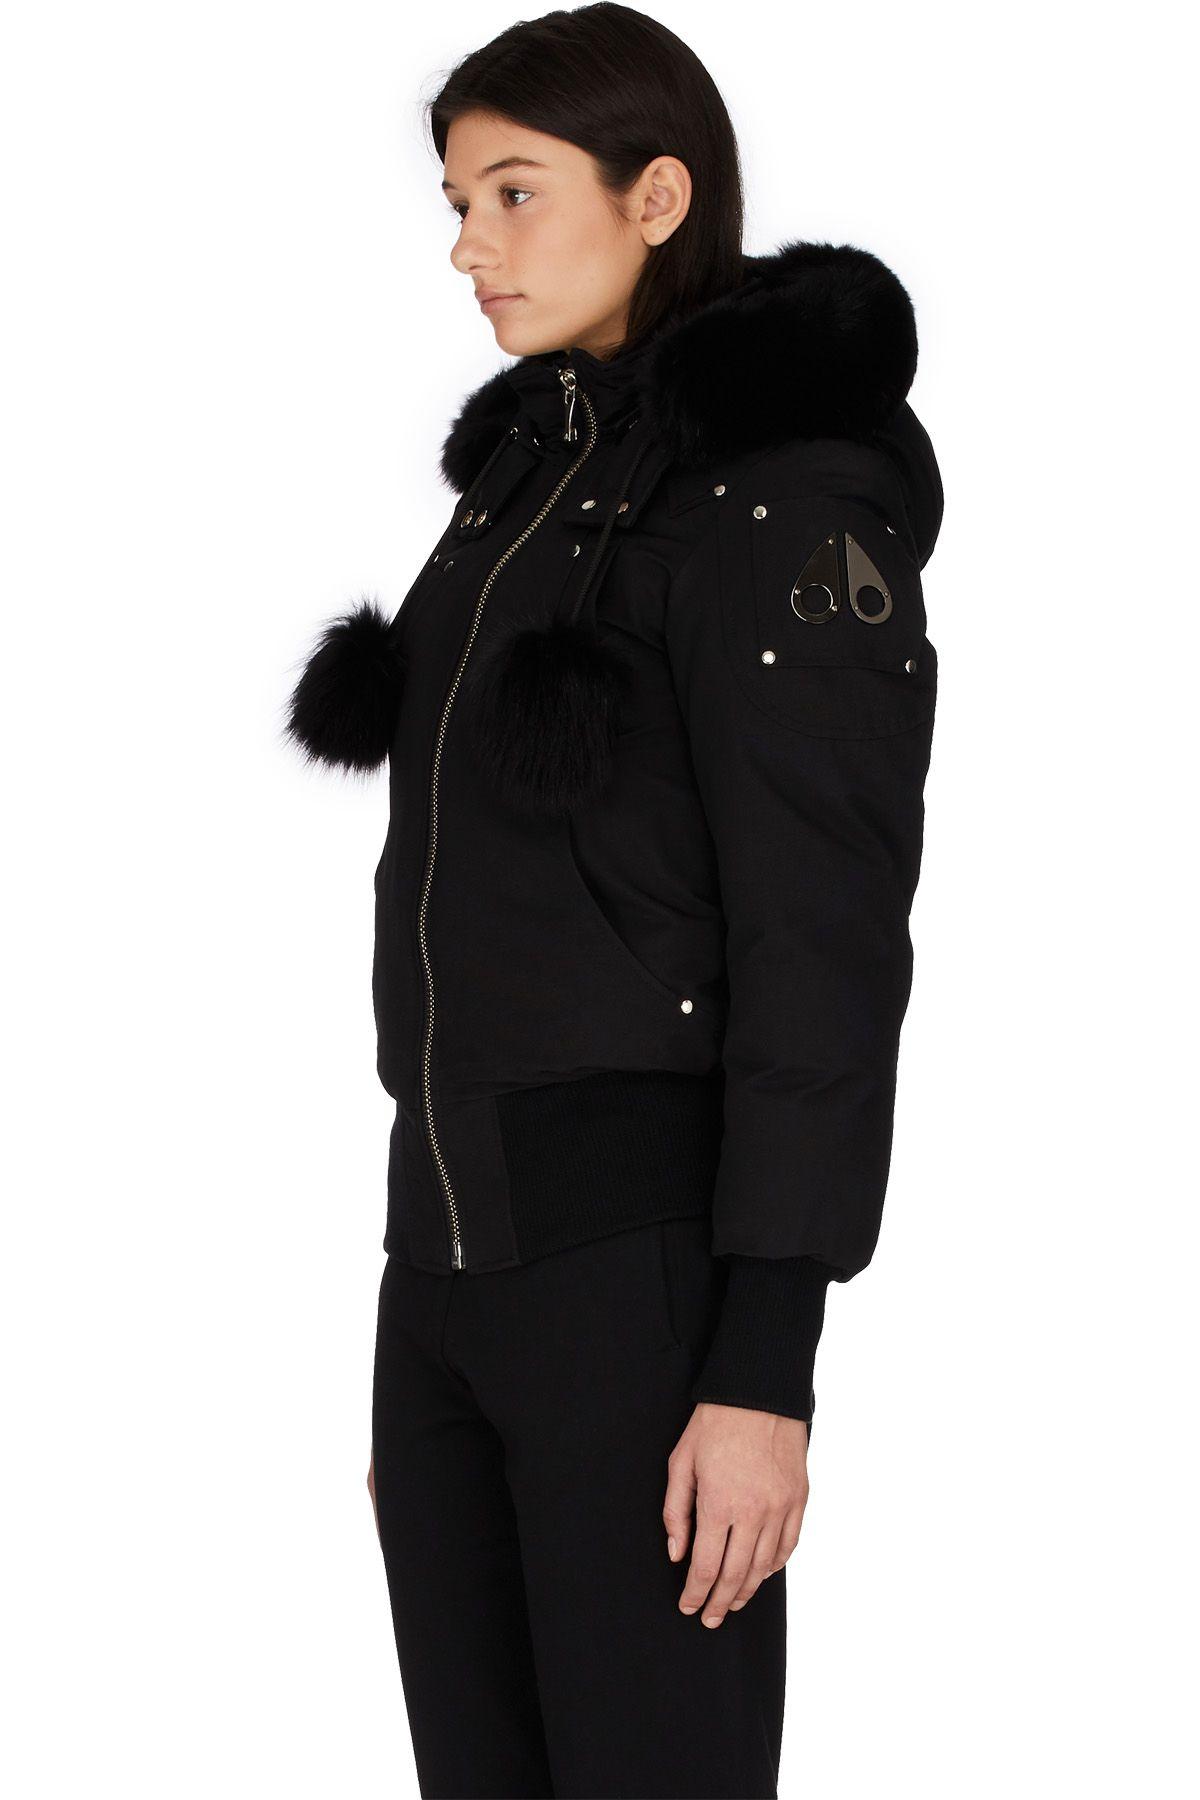 Moose Knuckles Debbie Bomber Black Black Jackets For Women Women S Coats Jackets Black [ 1800 x 1200 Pixel ]